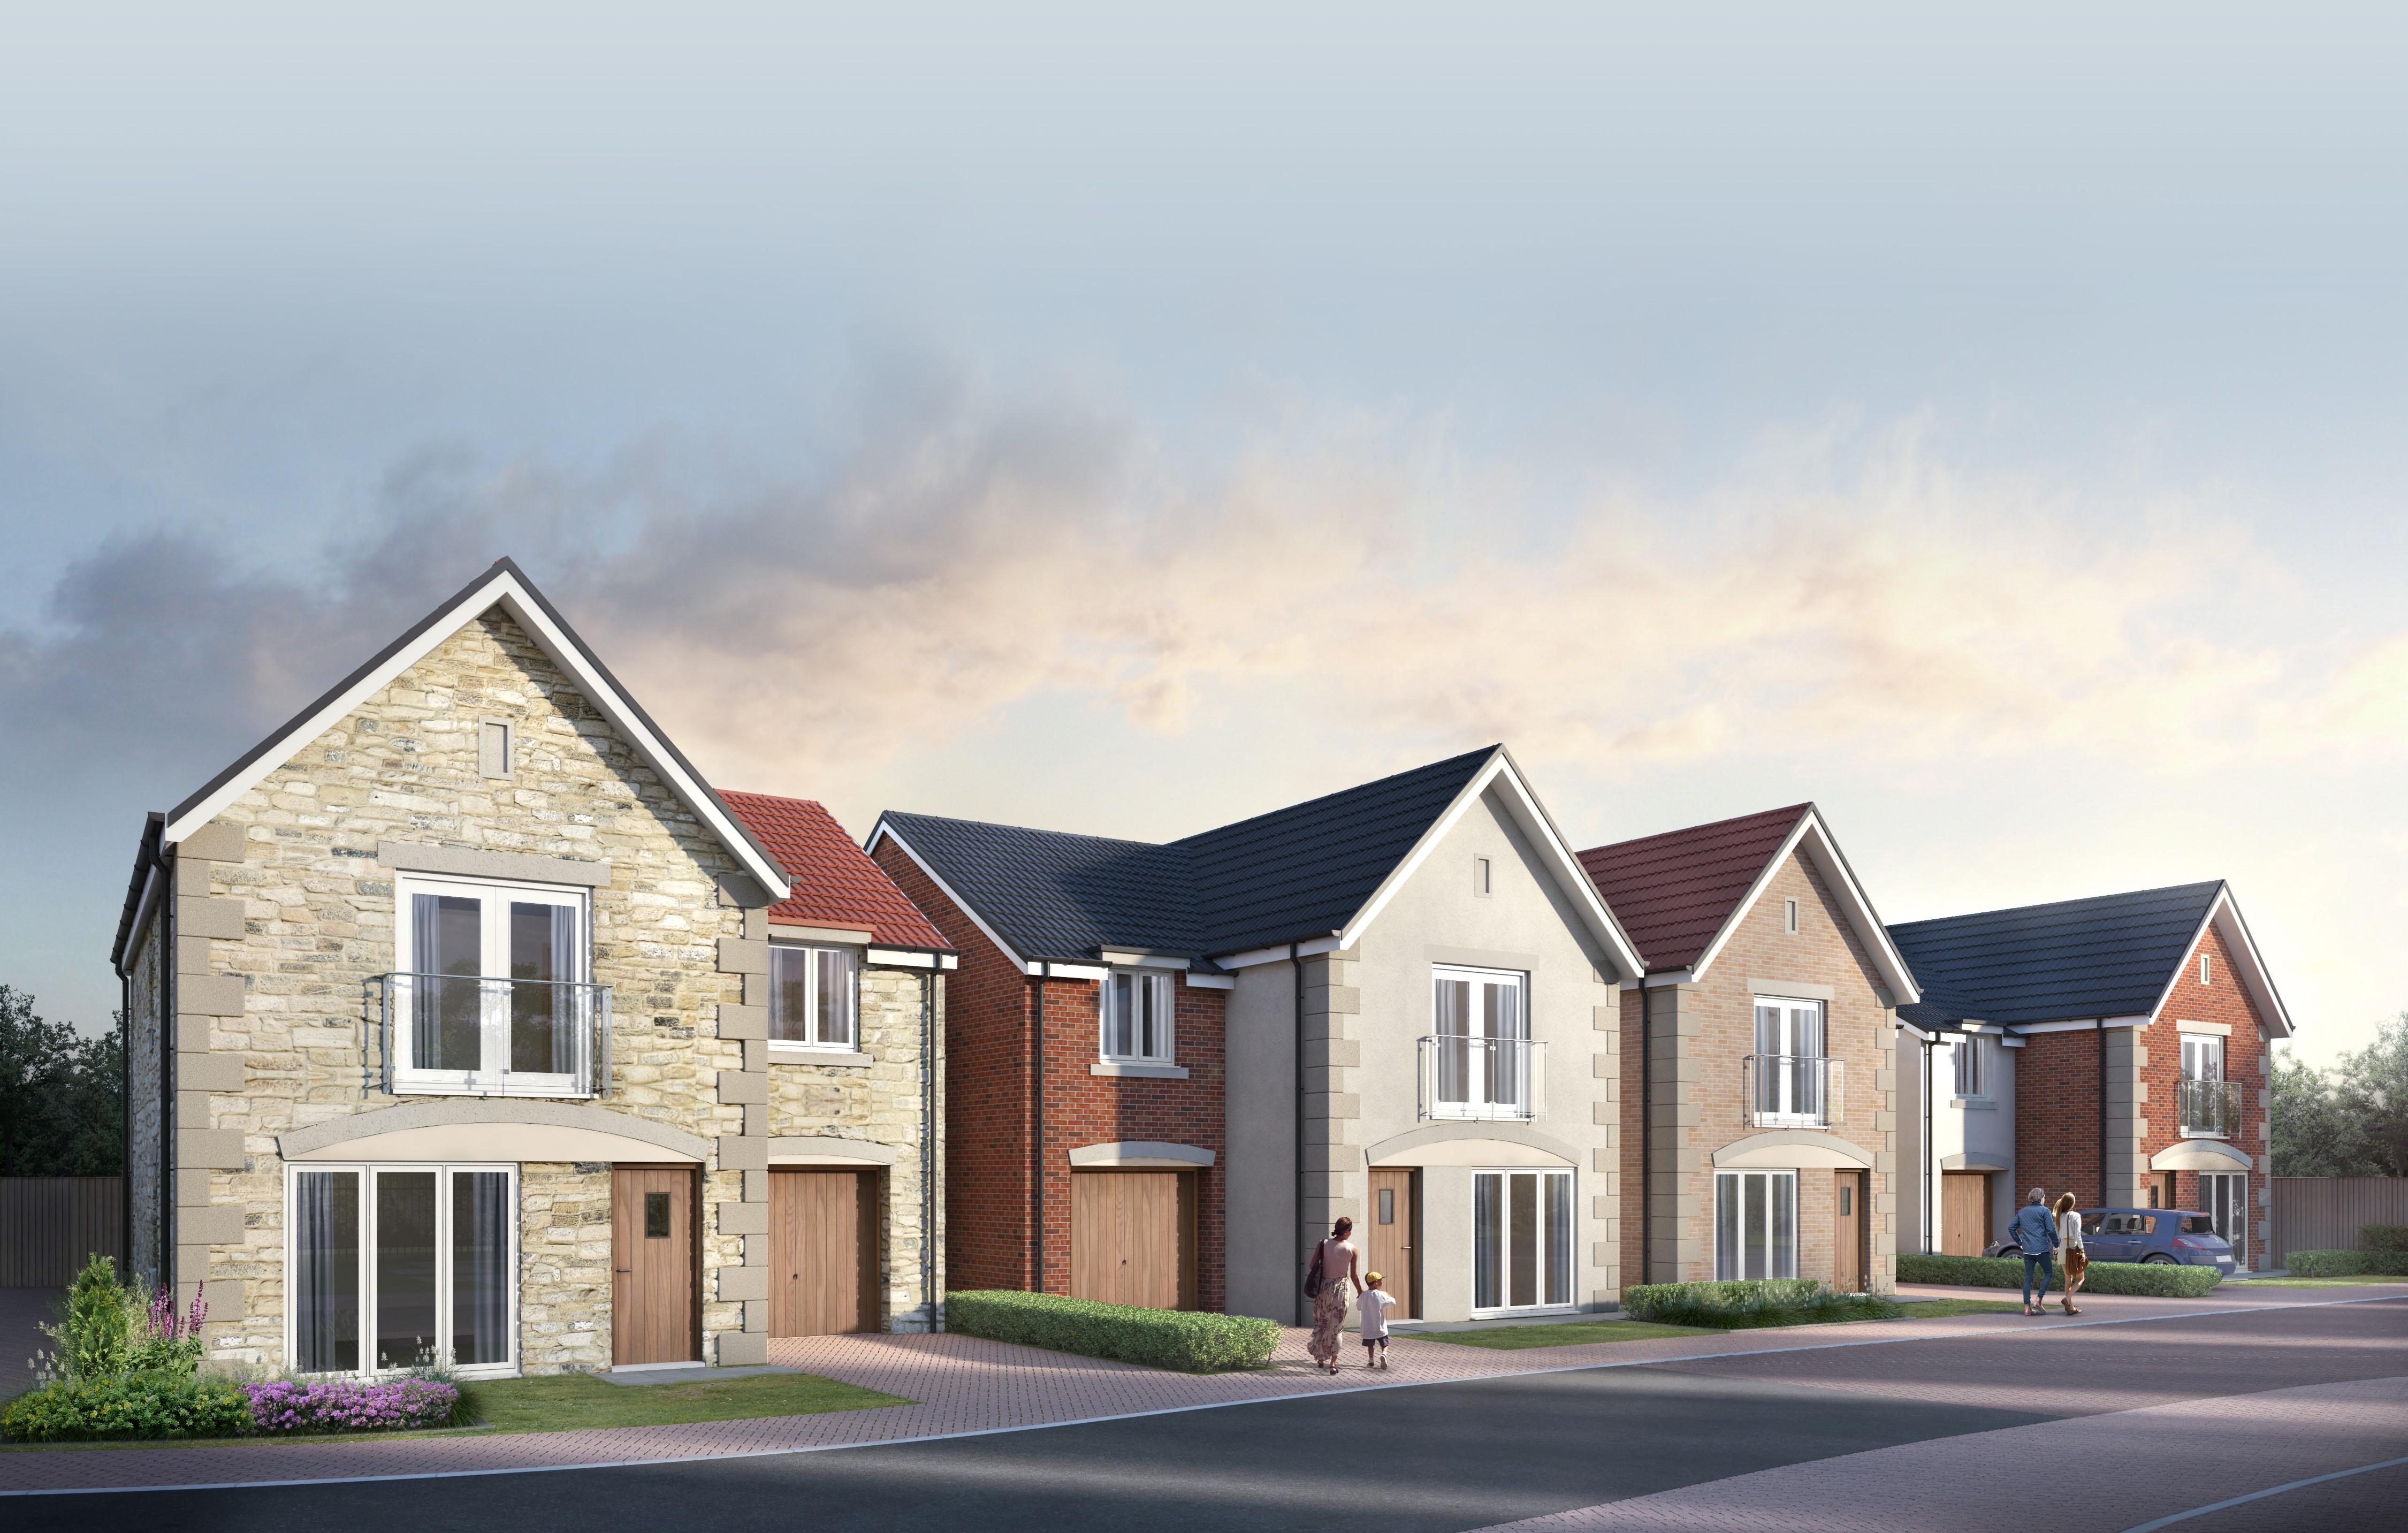 Family Focussed Housing Development Underway at Chilton